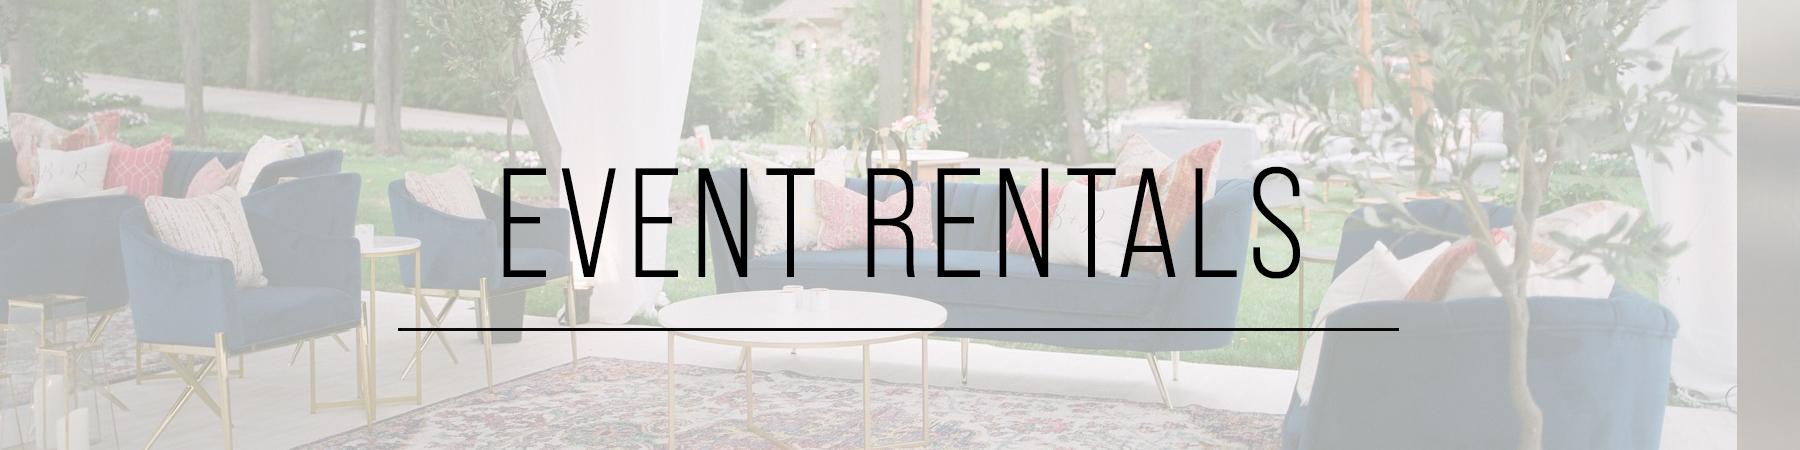 event rentals_header